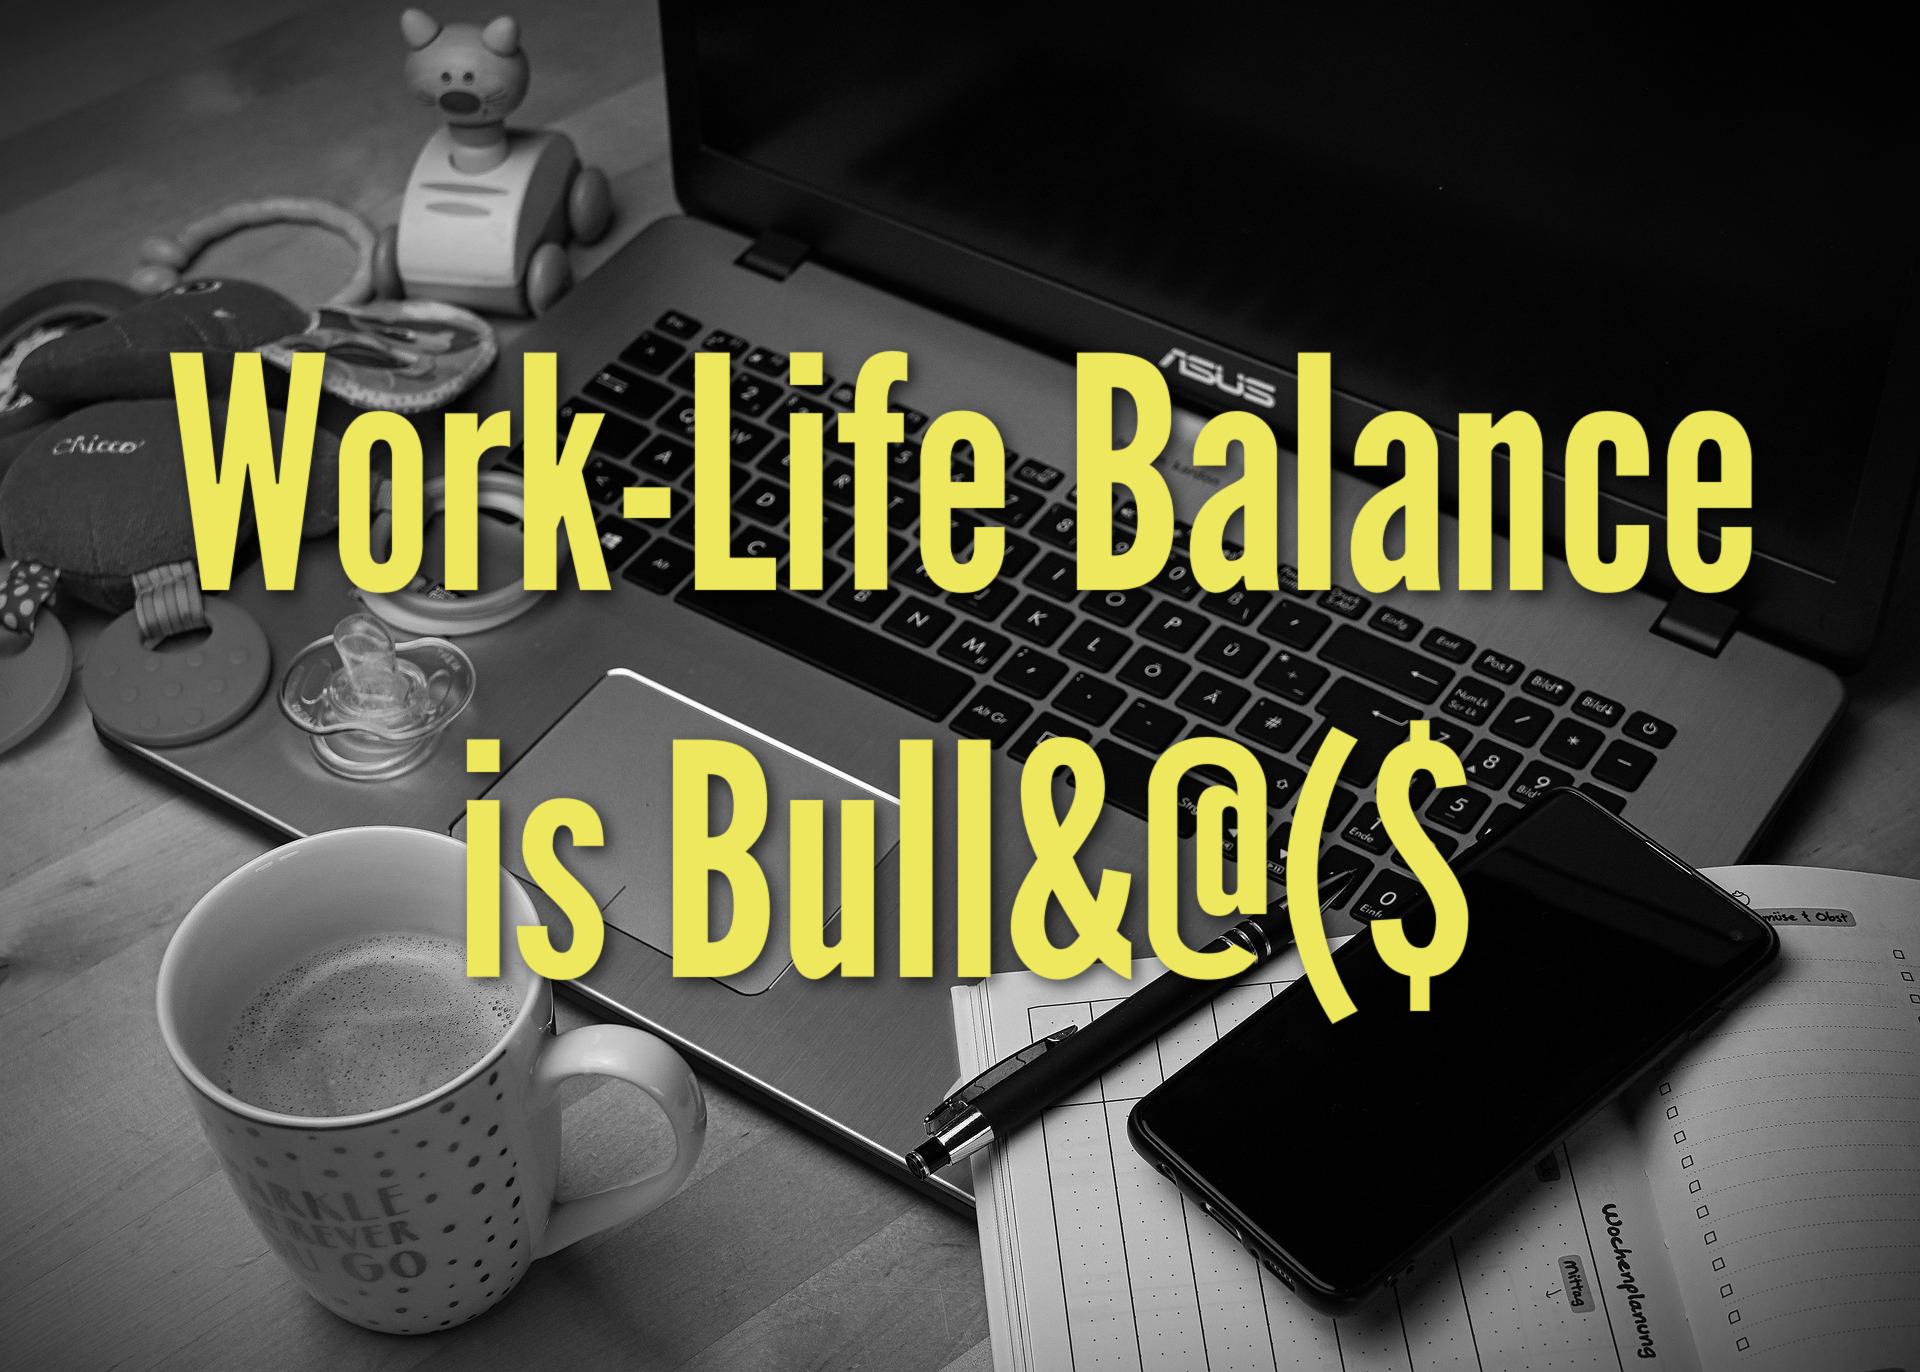 Work-Life Balance is Bull&@($